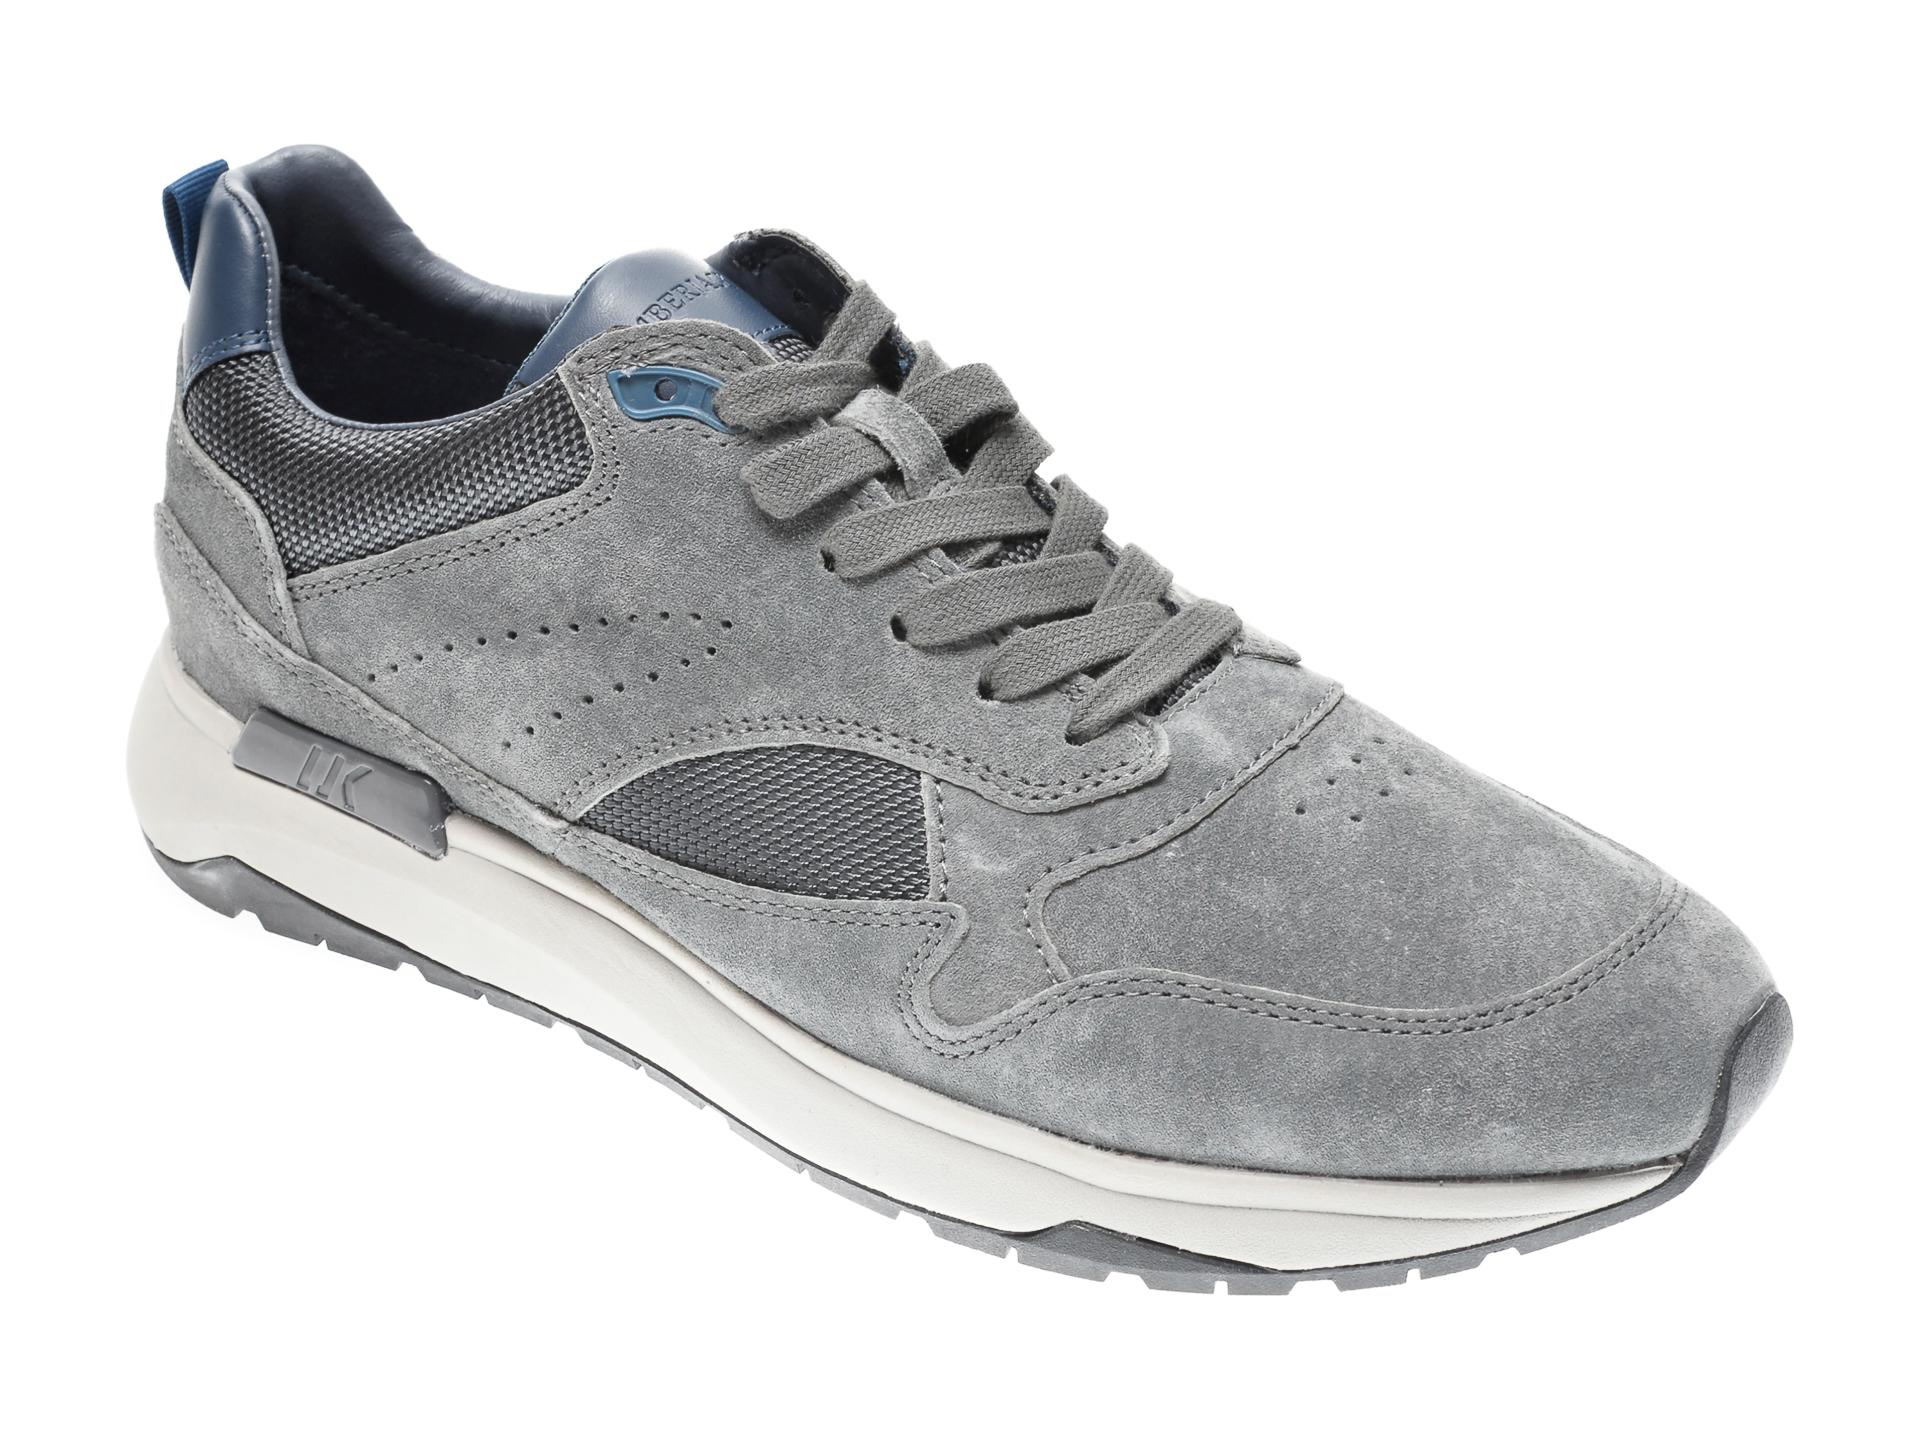 Pantofi LUMBERJACK gri, 405006, din piele intoarsa imagine